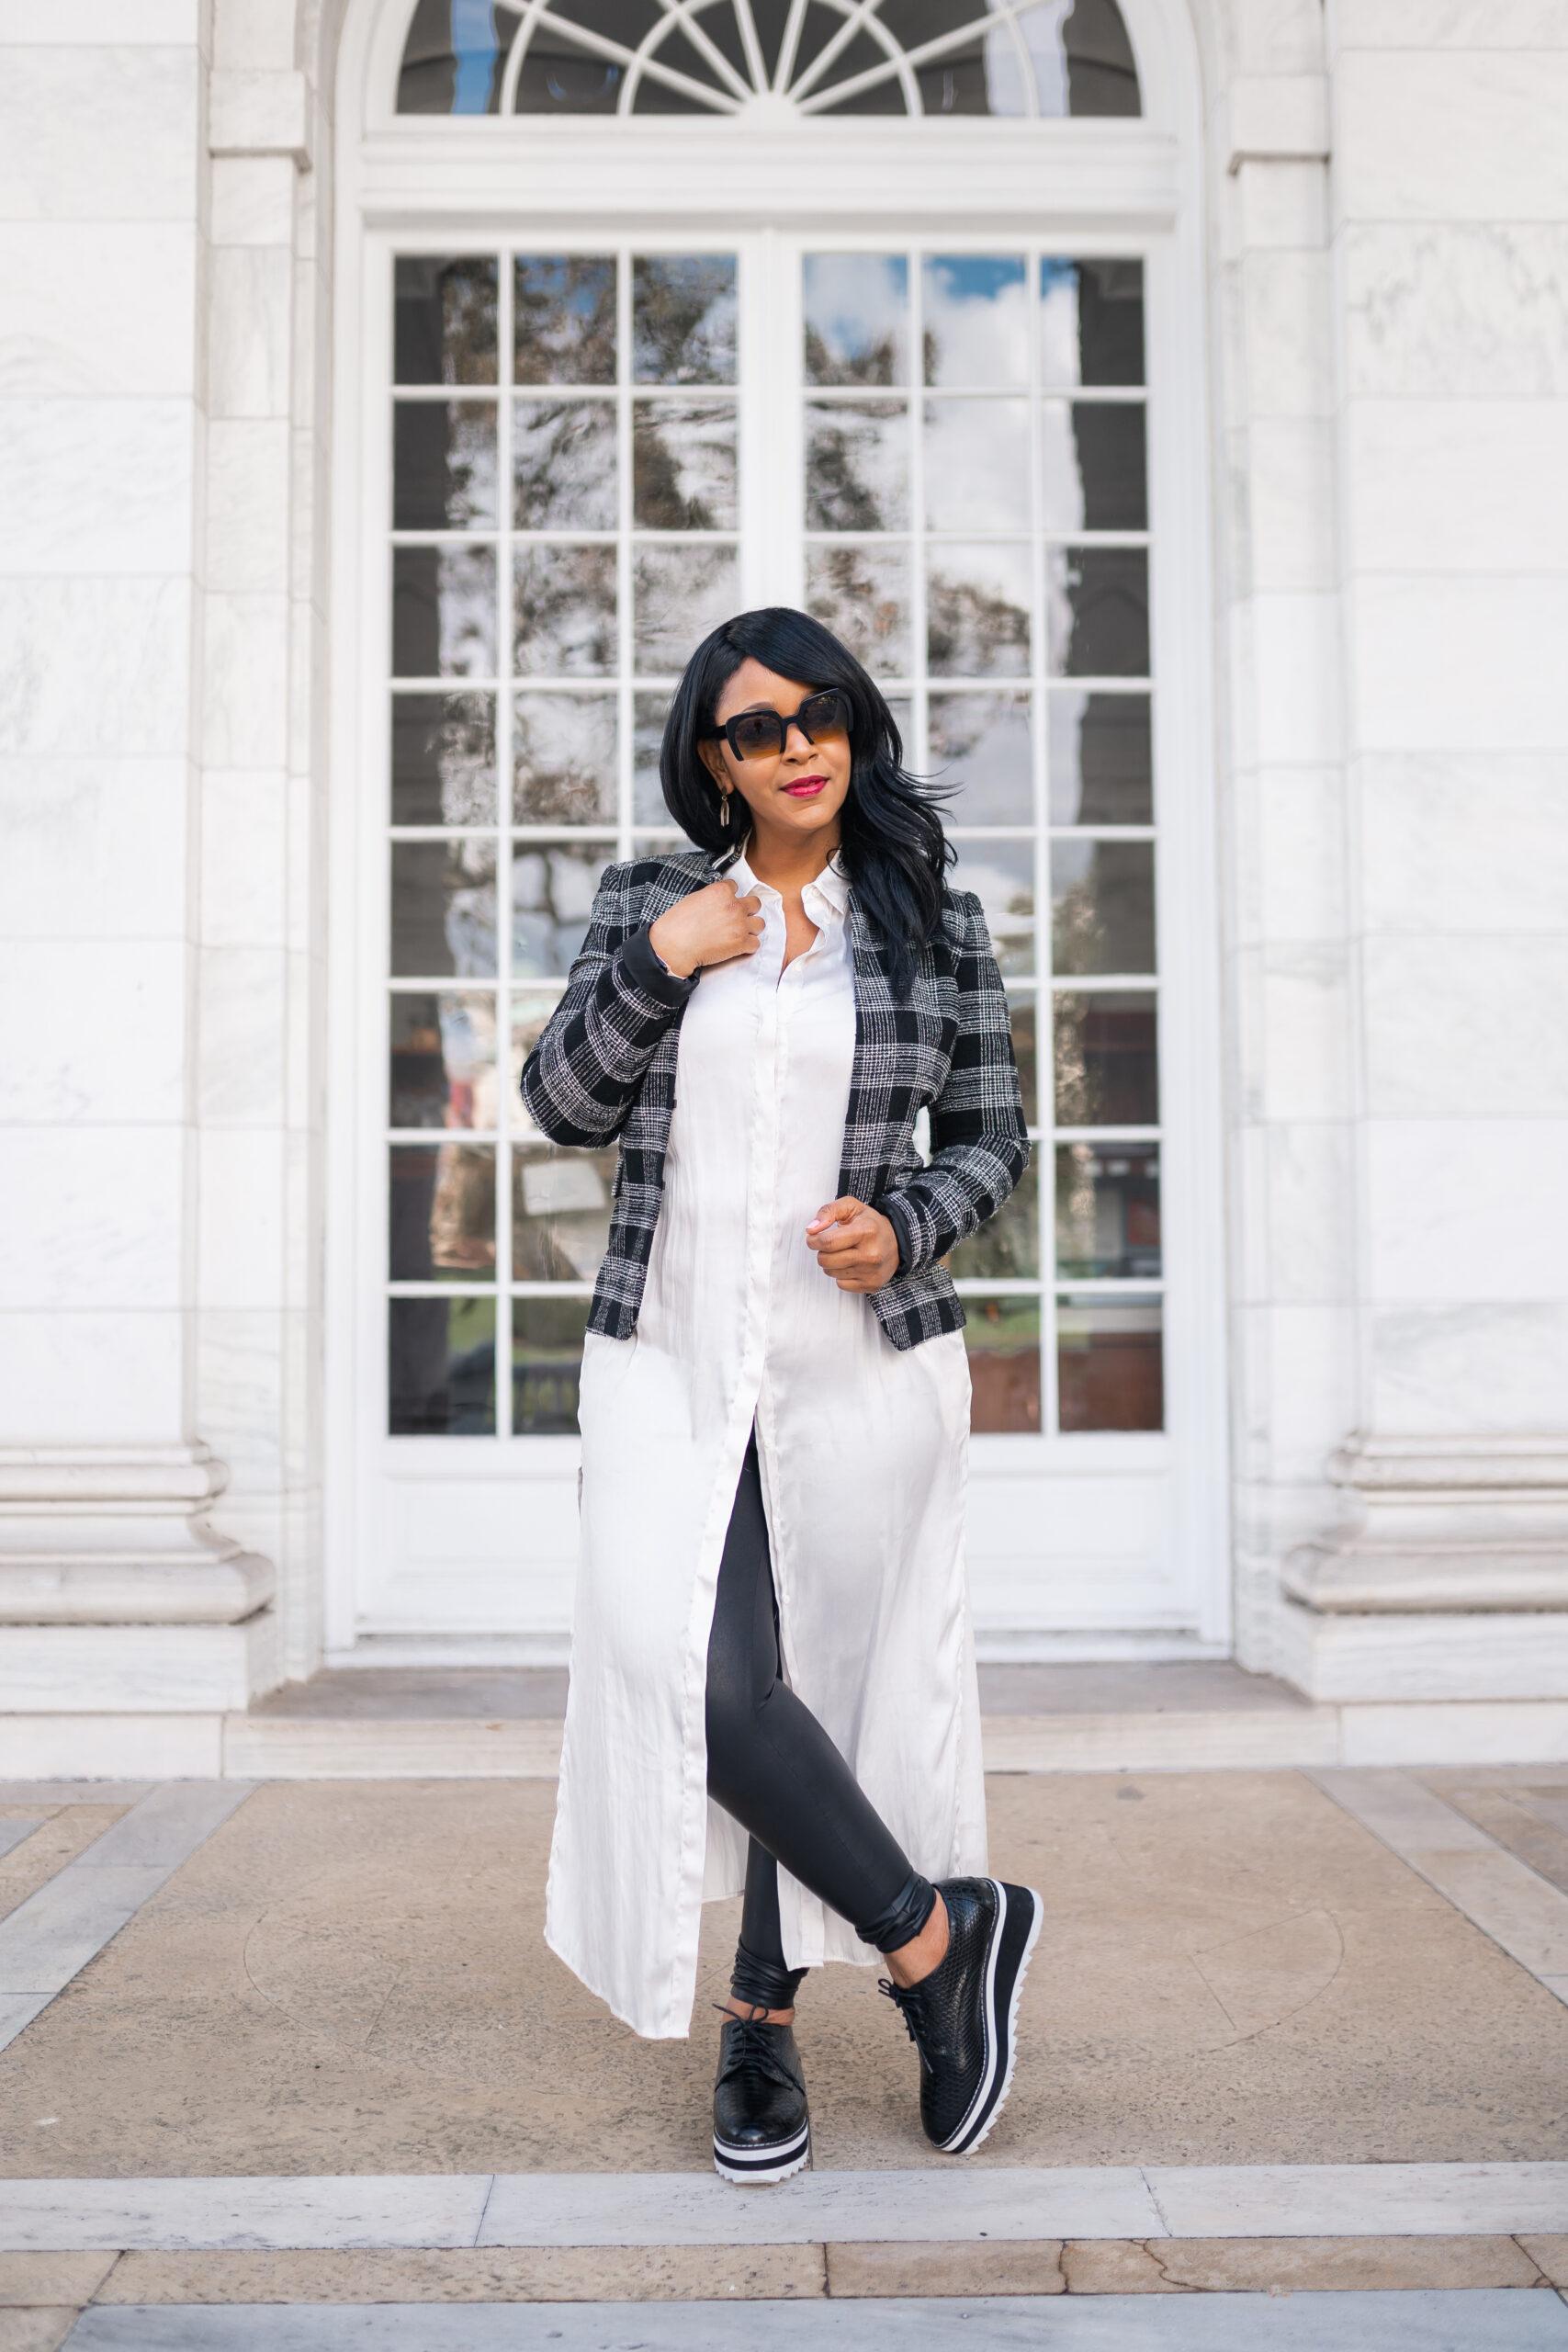 Three Ways to Wear Faux Leather Leggings, What I'm Wearing: Alice + Olivia Women's Black Harris Told You So Plaid Blazer, Satin Maxi Shirt, Snake Madden Girl Marshall Flatform Lug Sole Oxfords